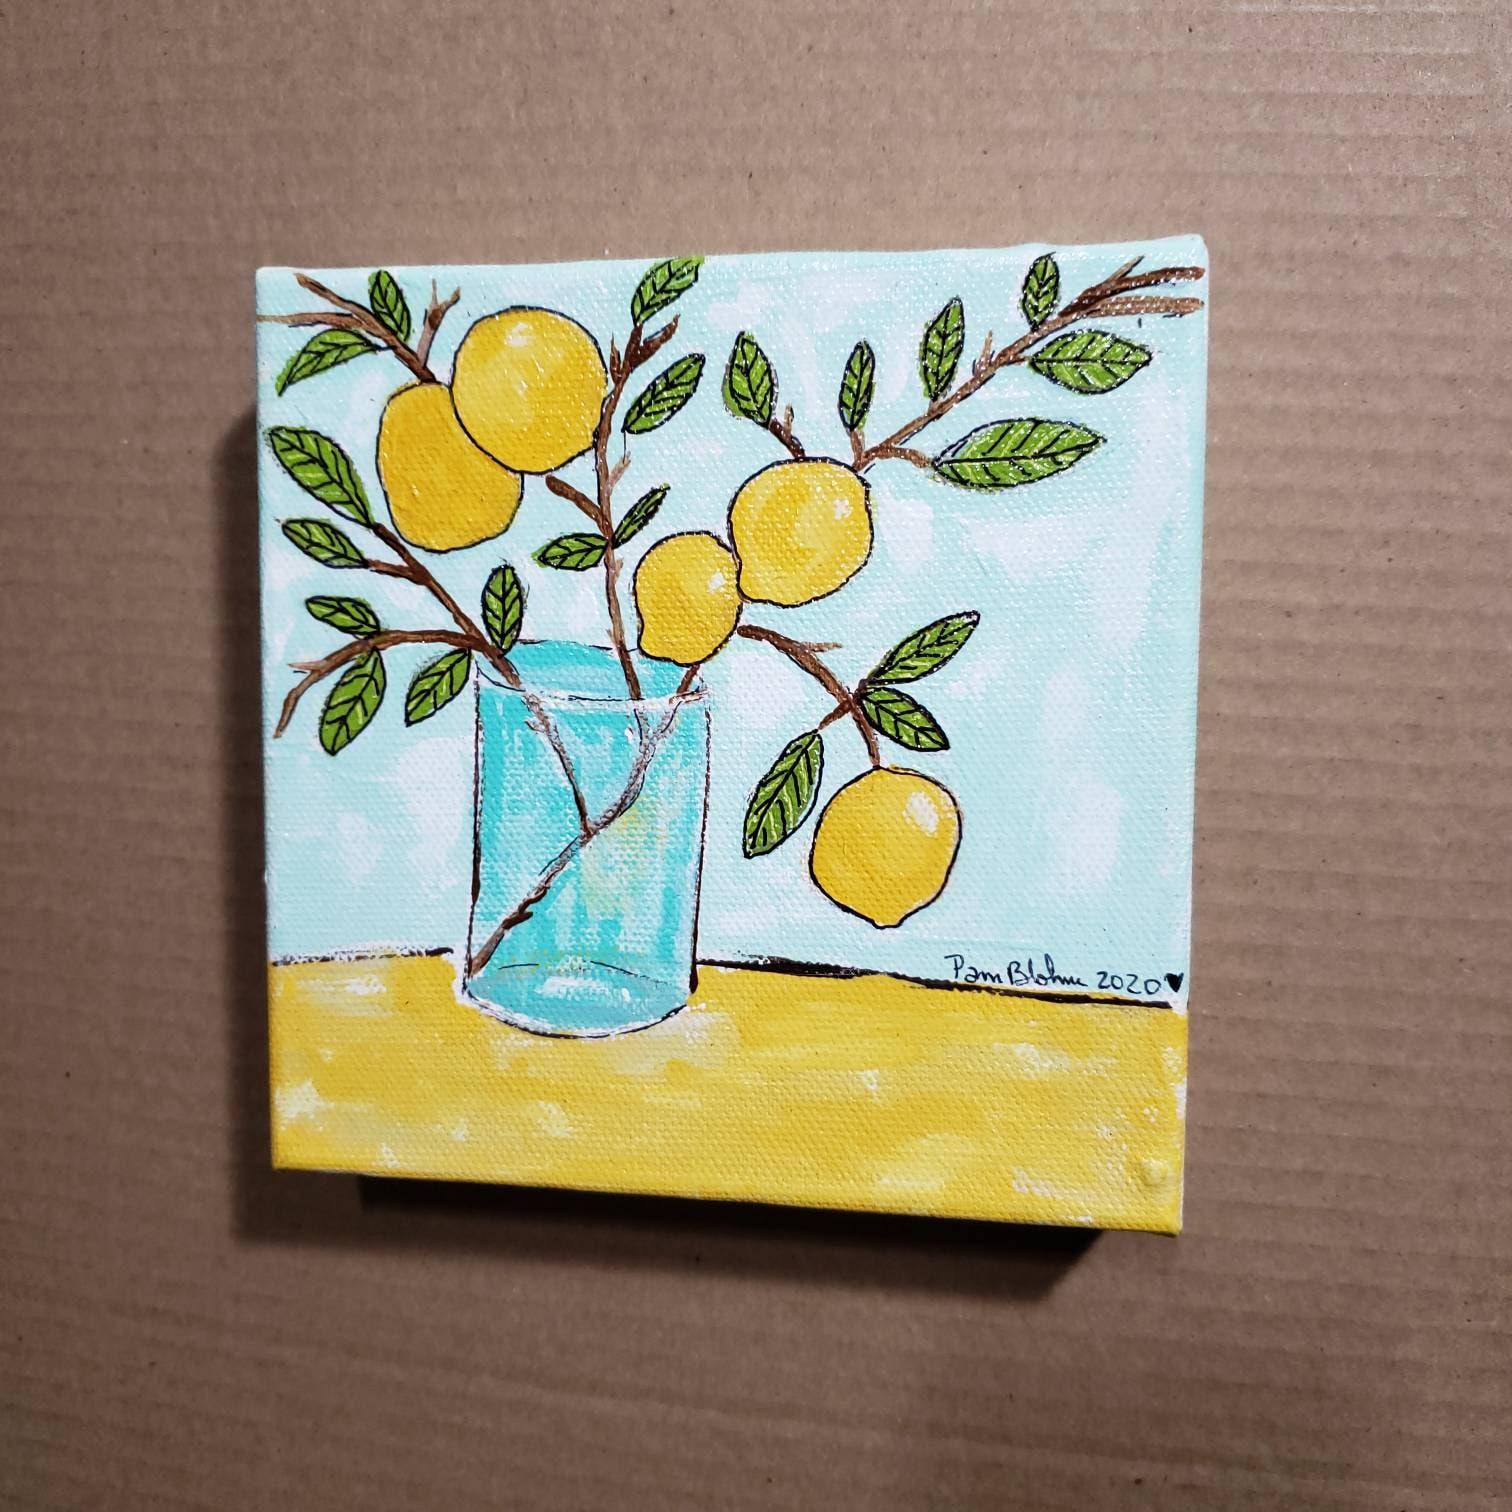 6x6 Deep Canvas Lemon Branch Original Acrylic Painting Kitchen Or Office Decor Shelf Or Wall Art